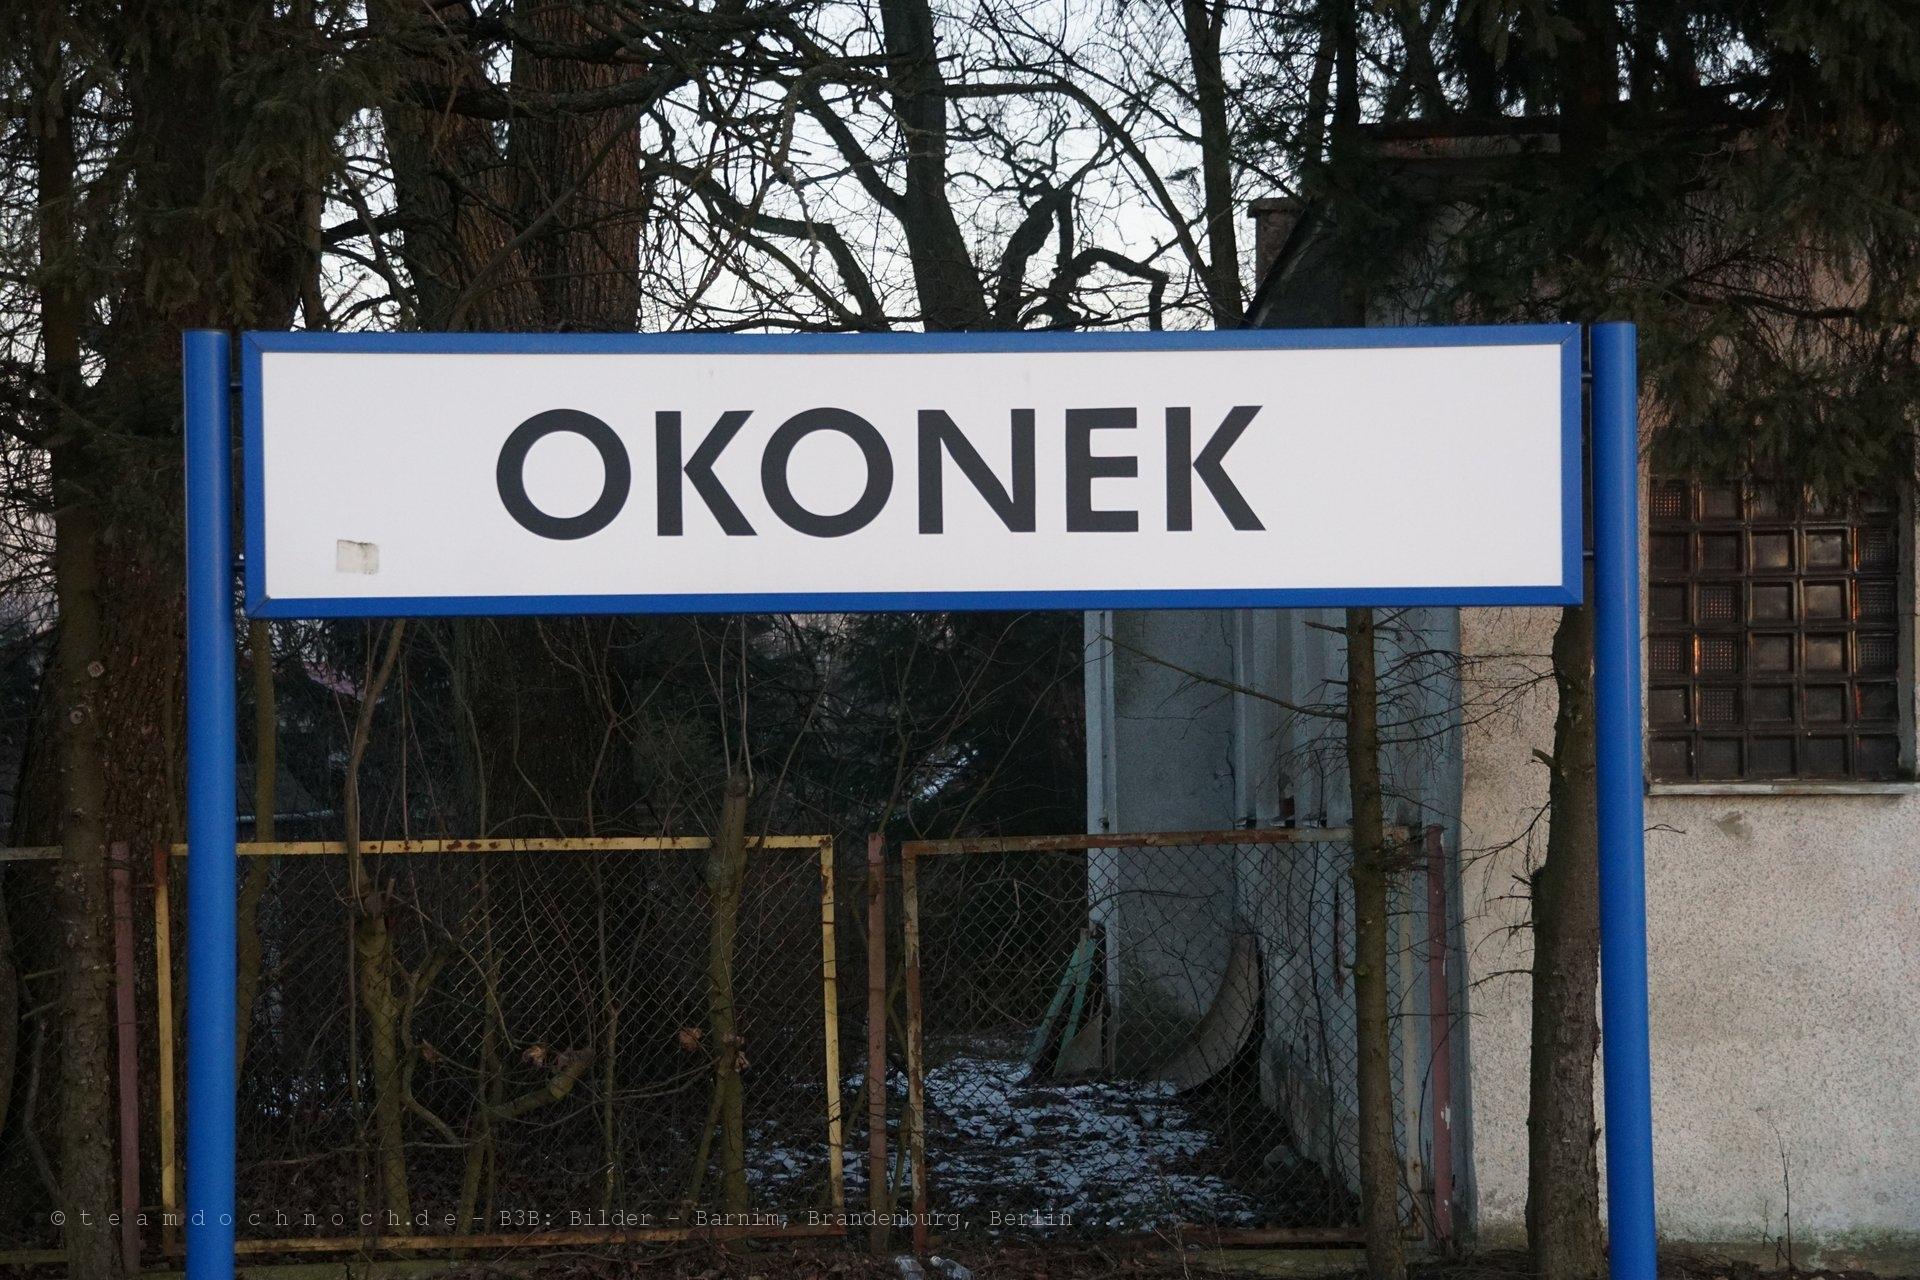 Bahnhof Okonek